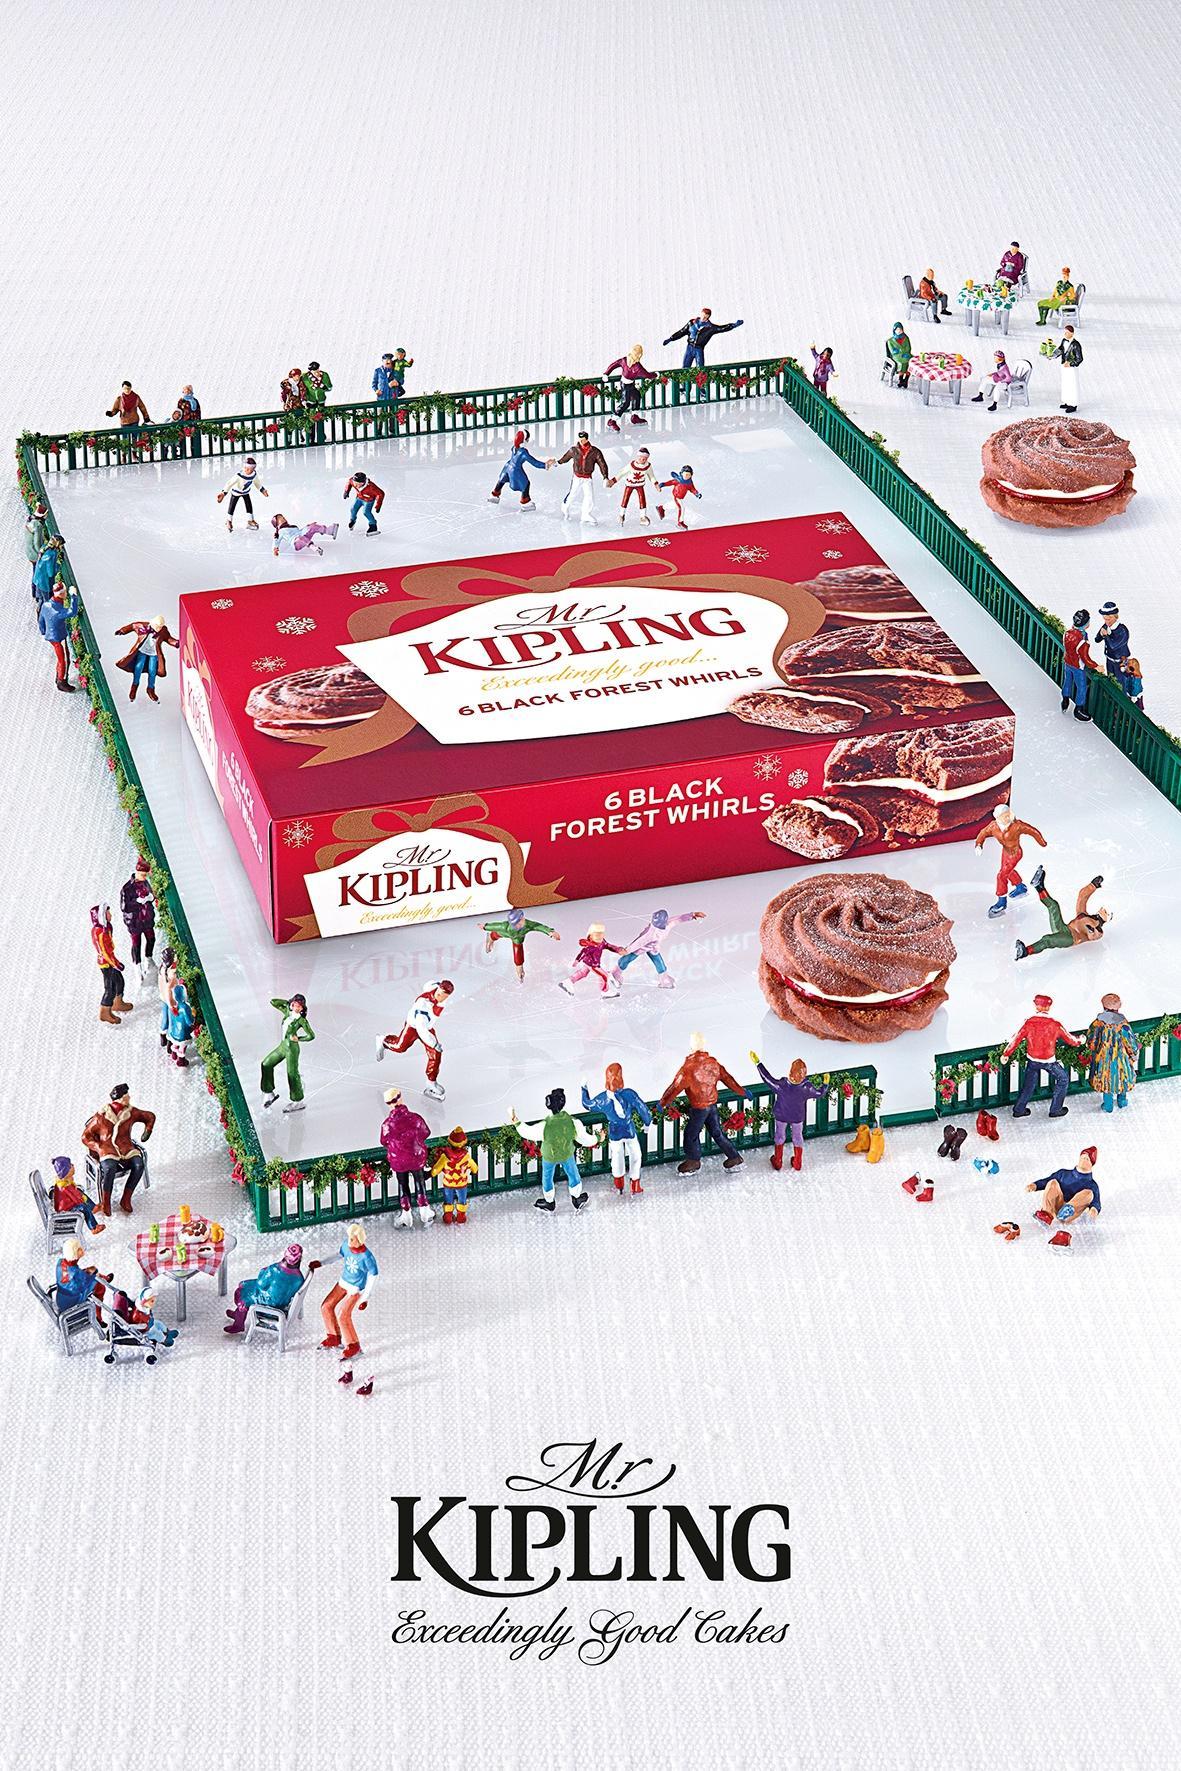 Mr Kipling Print Ad -  Ice Skating